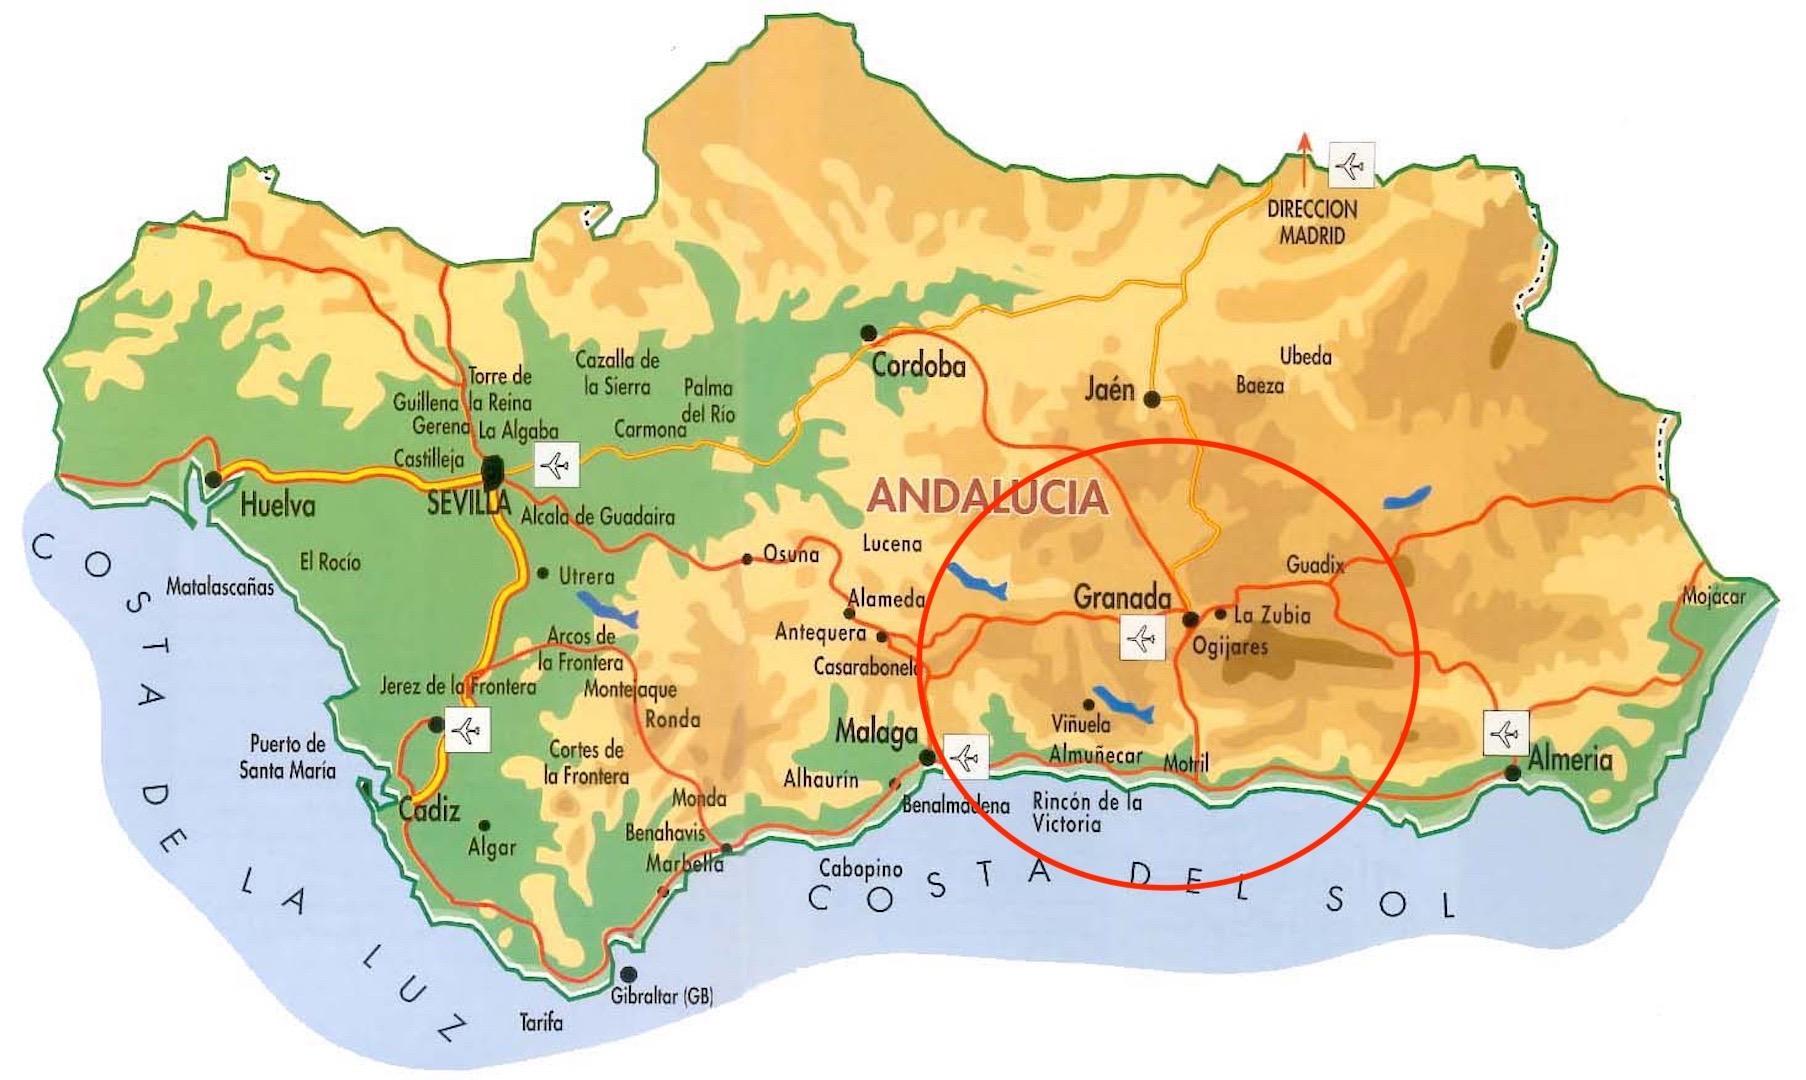 Carte Andalousie Histoire.Une Histoire Andalouse 2 Memorabilia